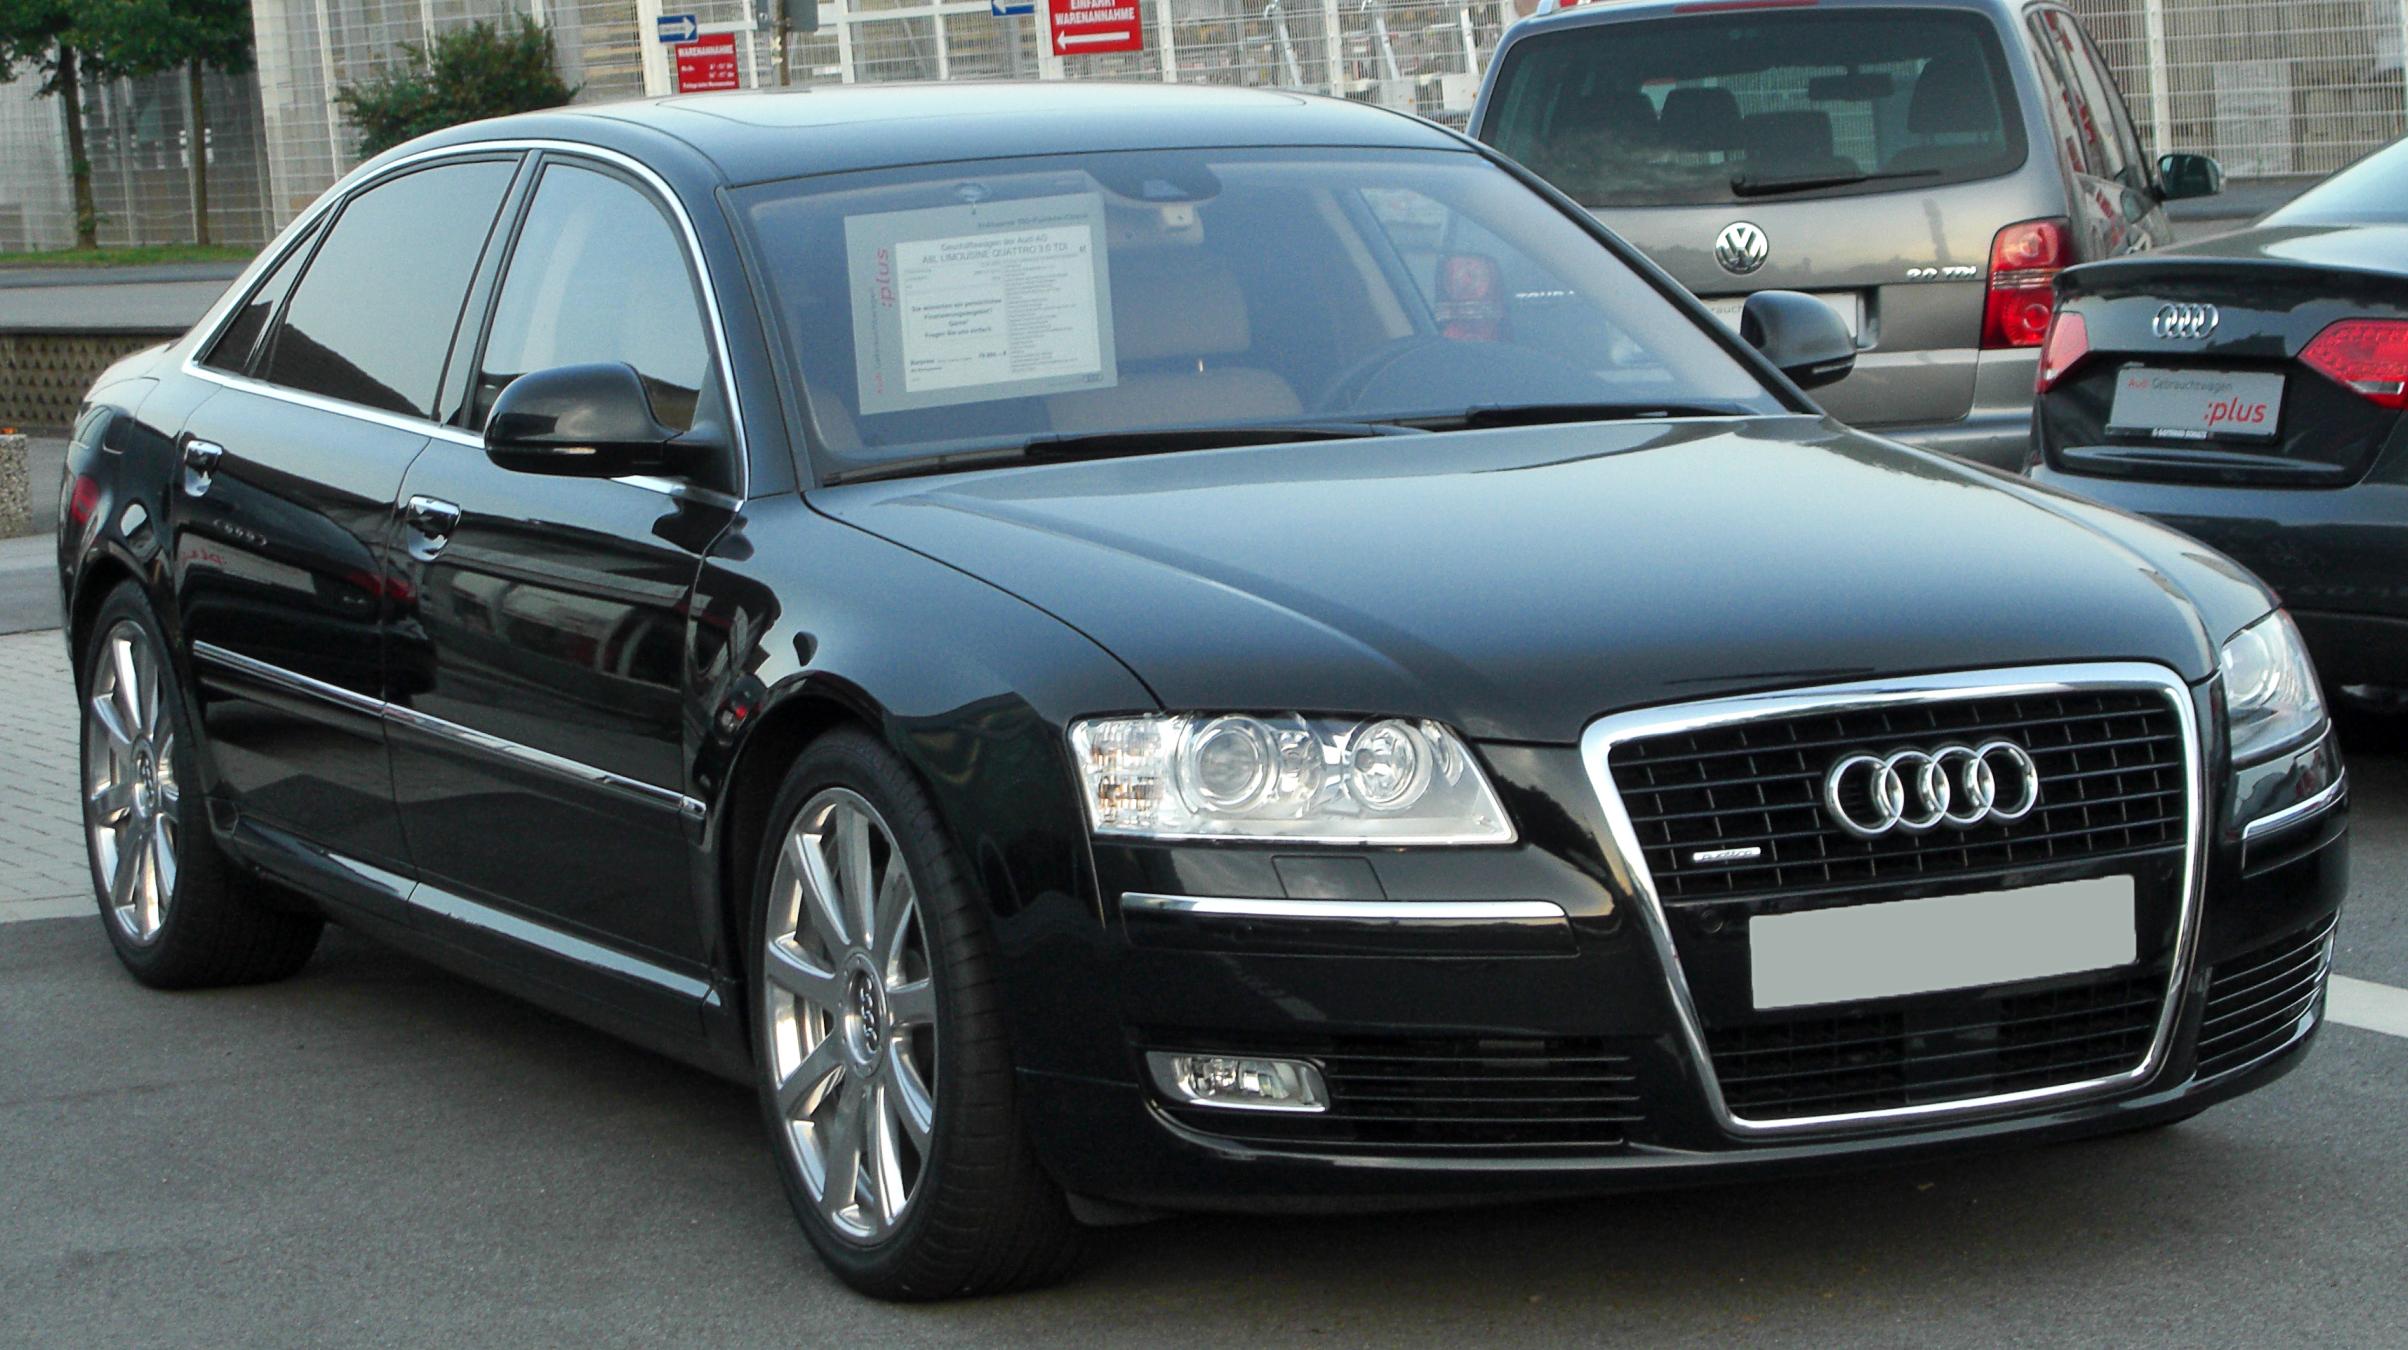 Audi A8 II (D3) Restyling 2005 - 2007 Sedan #3